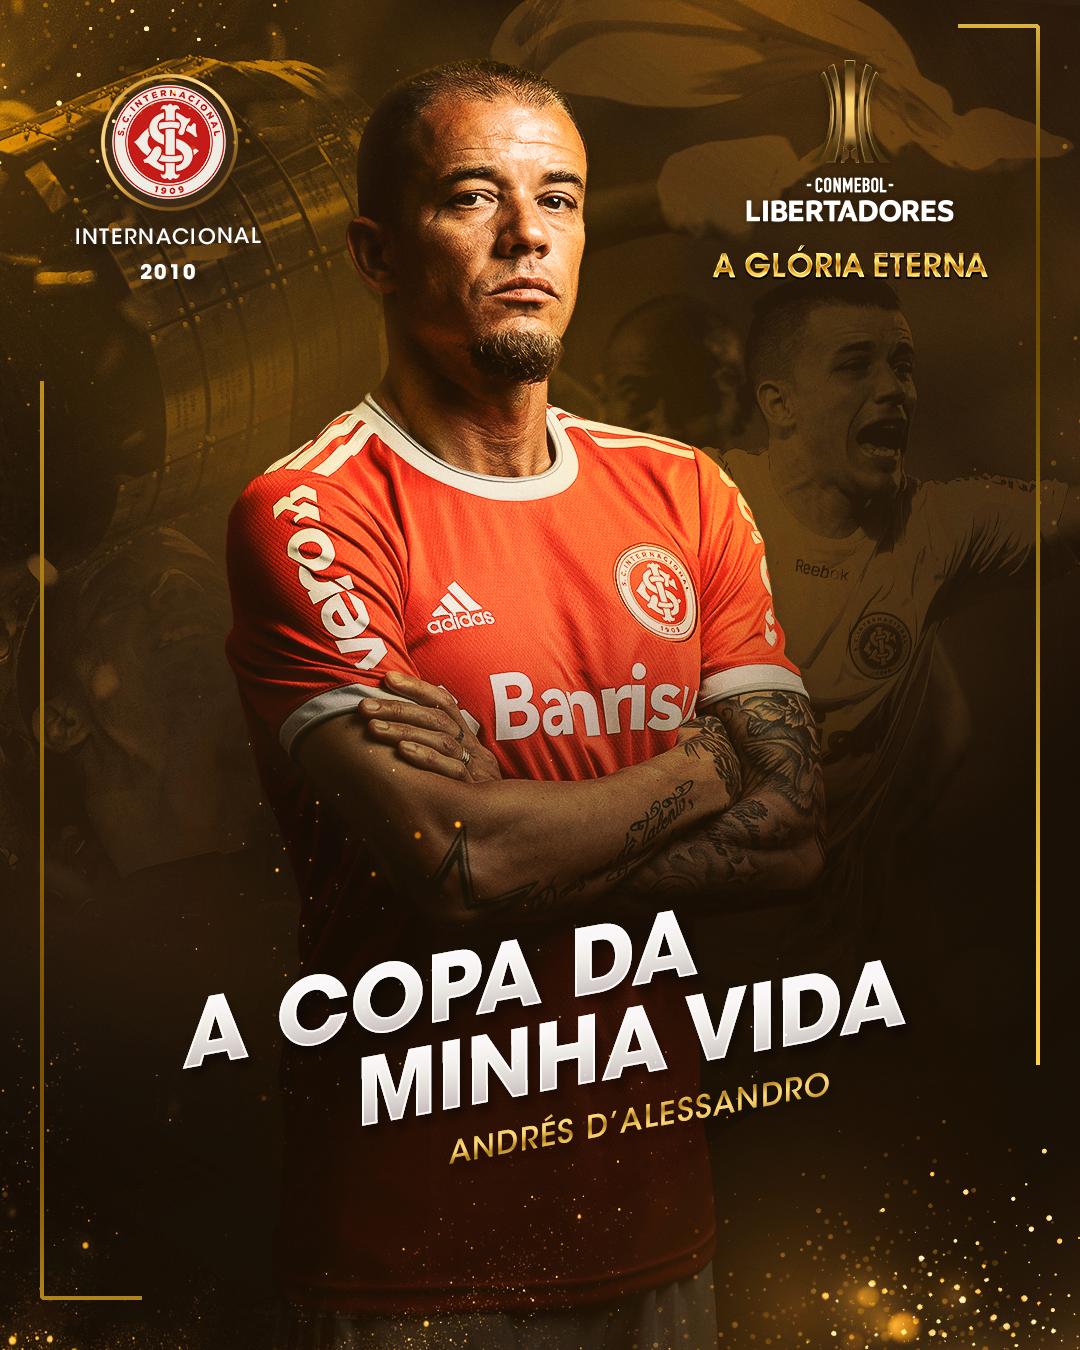 D'Alessandro - A Copa da Minha Vida - Internacional 2010